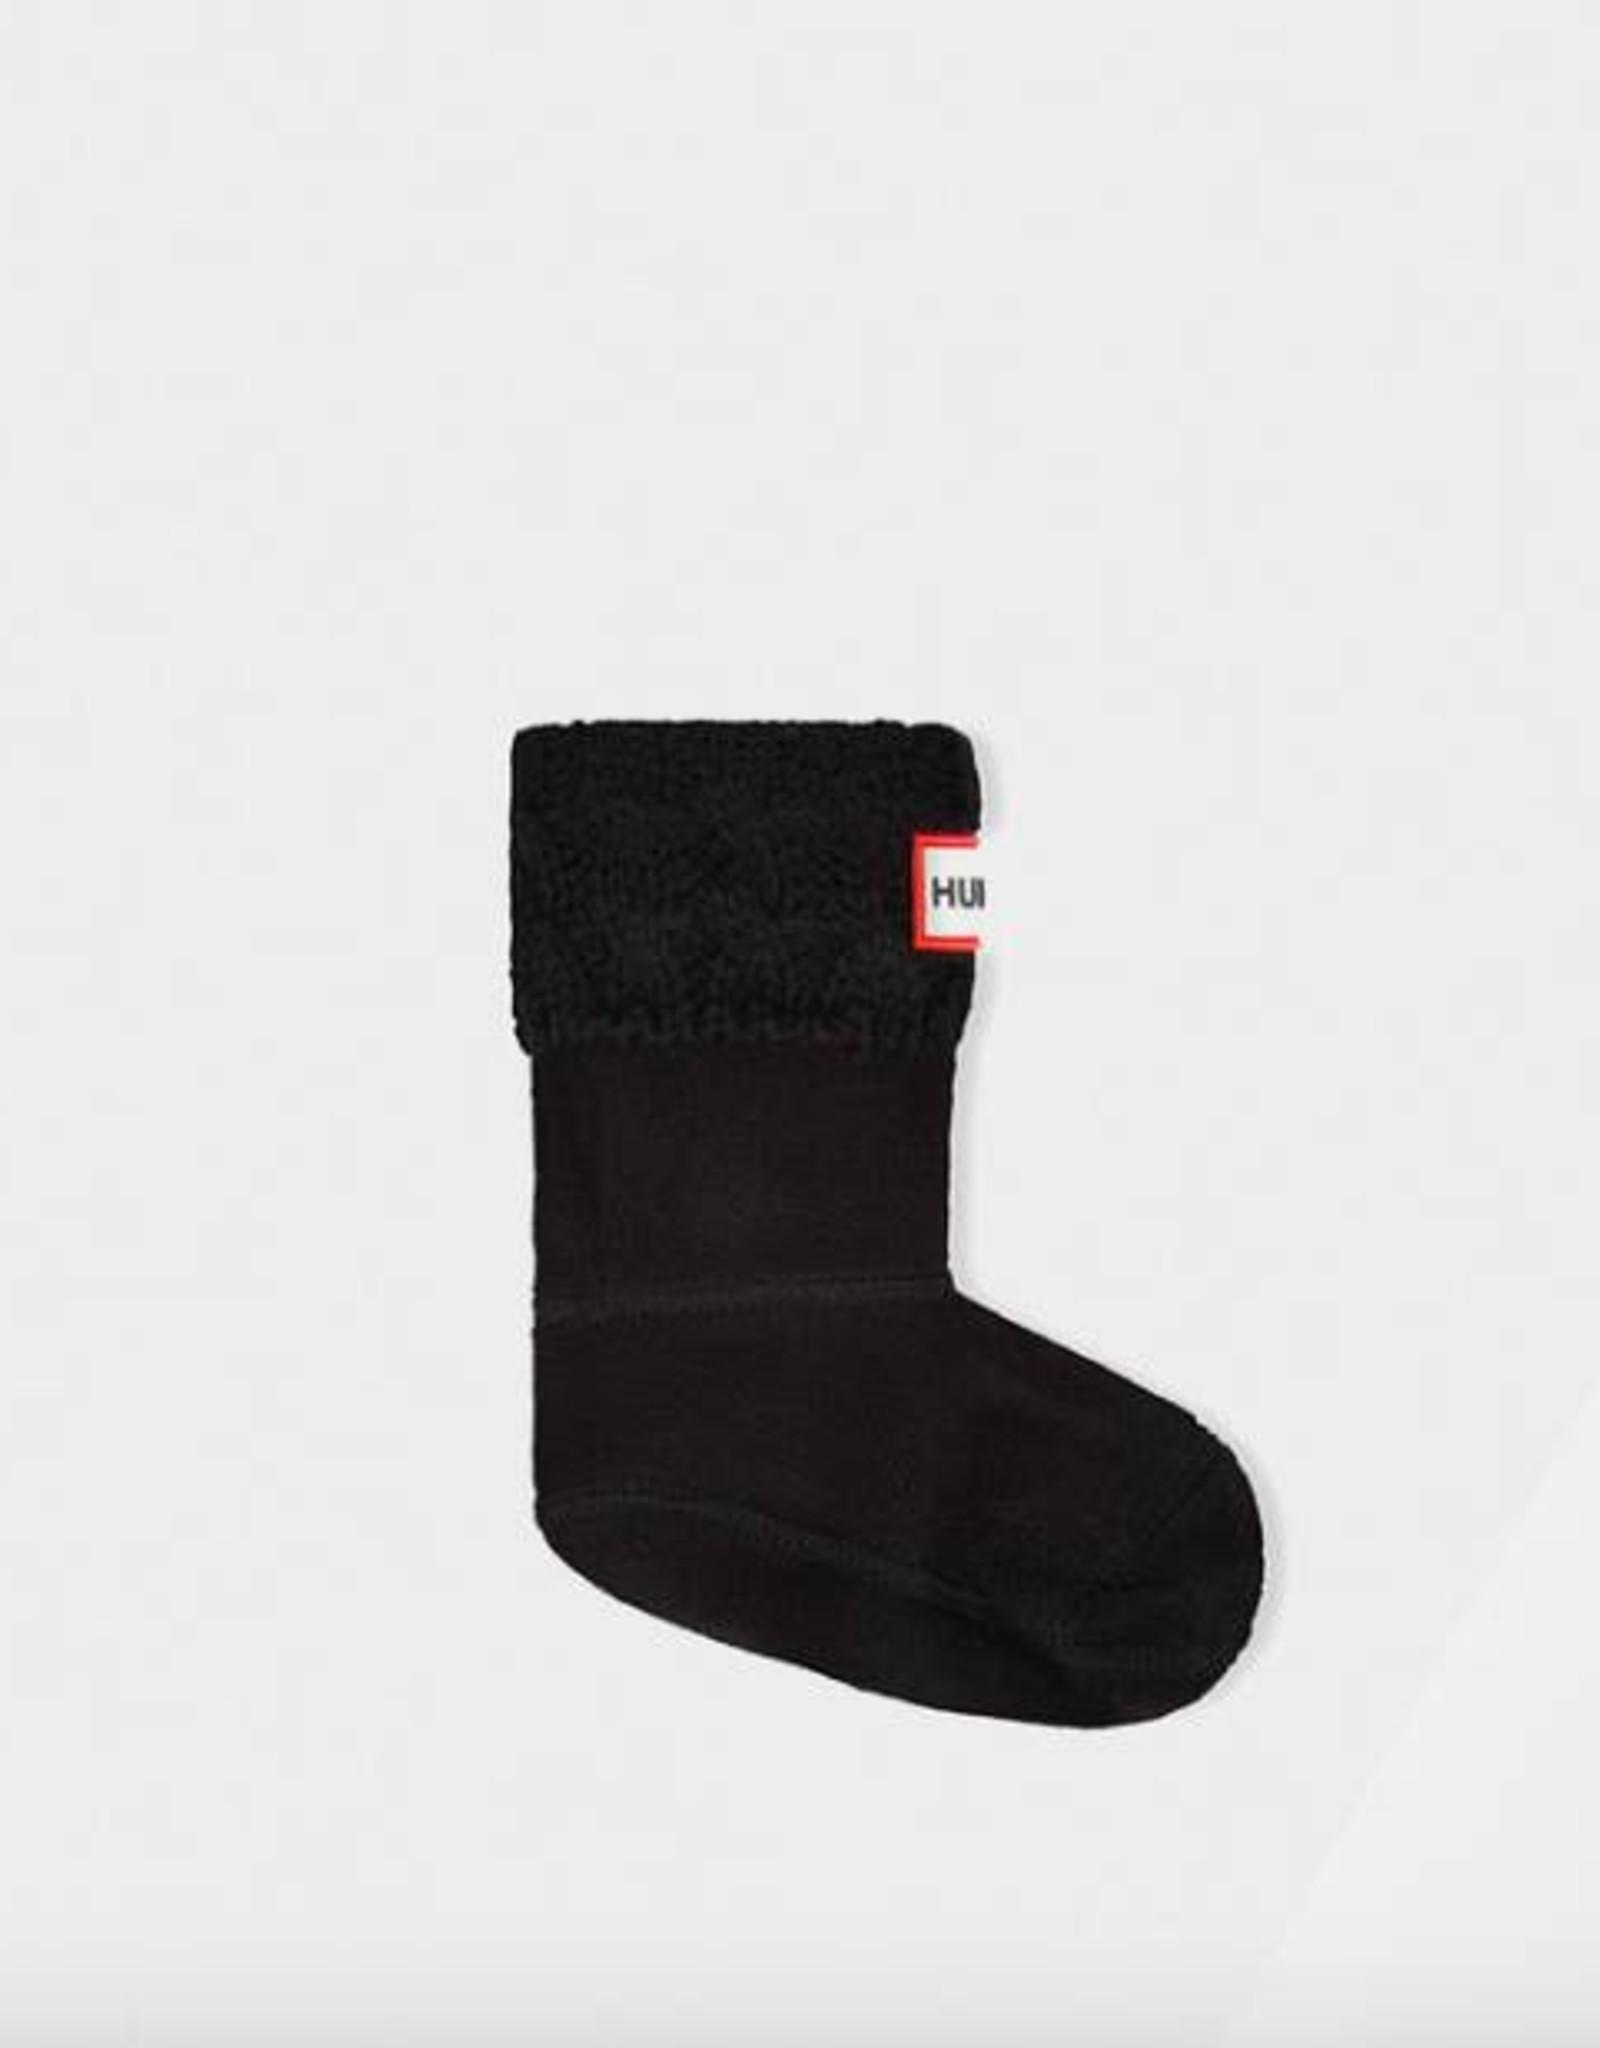 Six-Stitch Cable Boot Socks